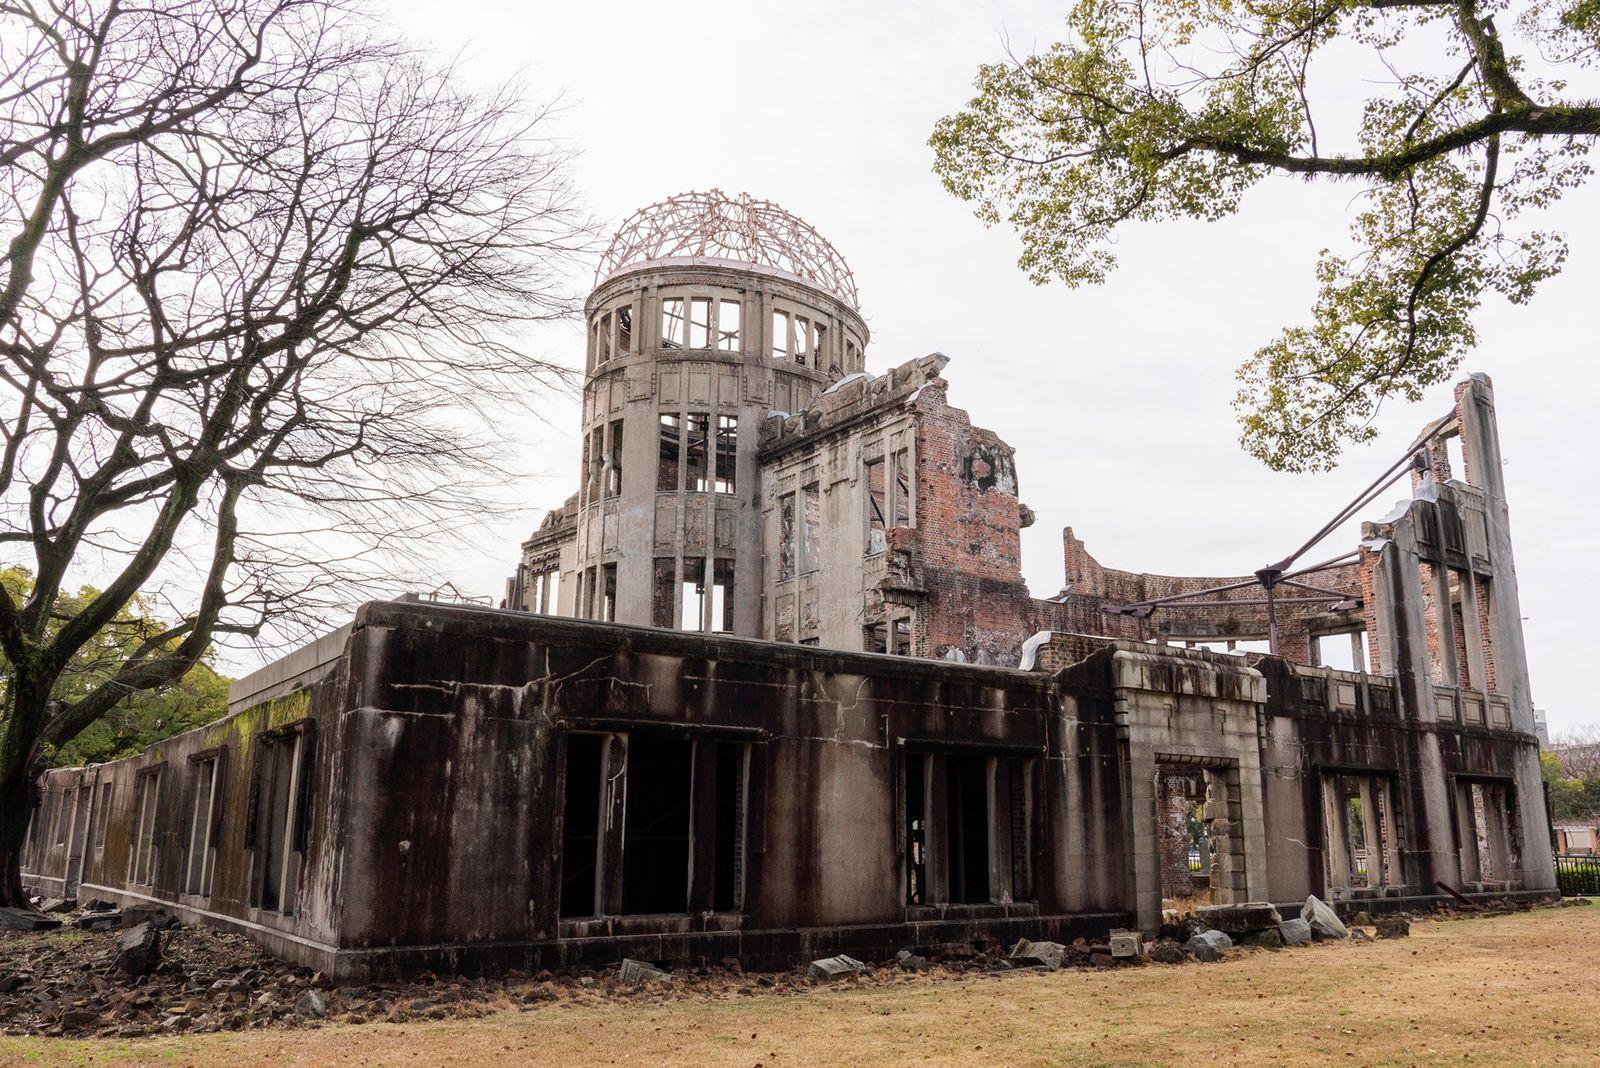 Exposición Comercial de la Prefectura de Hiroshima